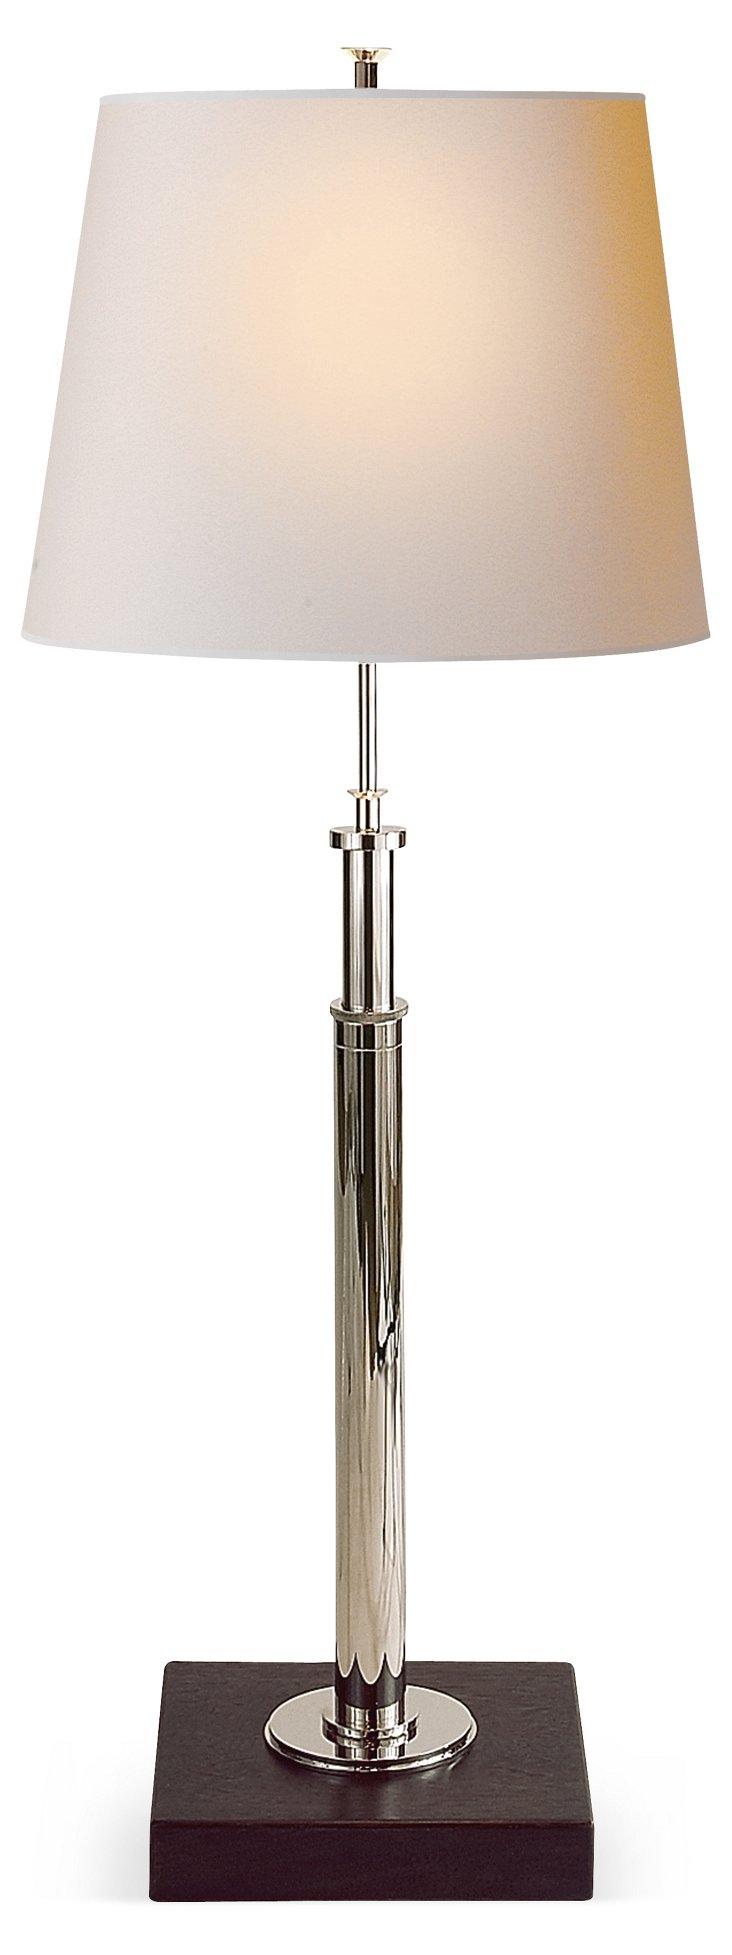 Scott Telescopic Table Lamp, Nickel